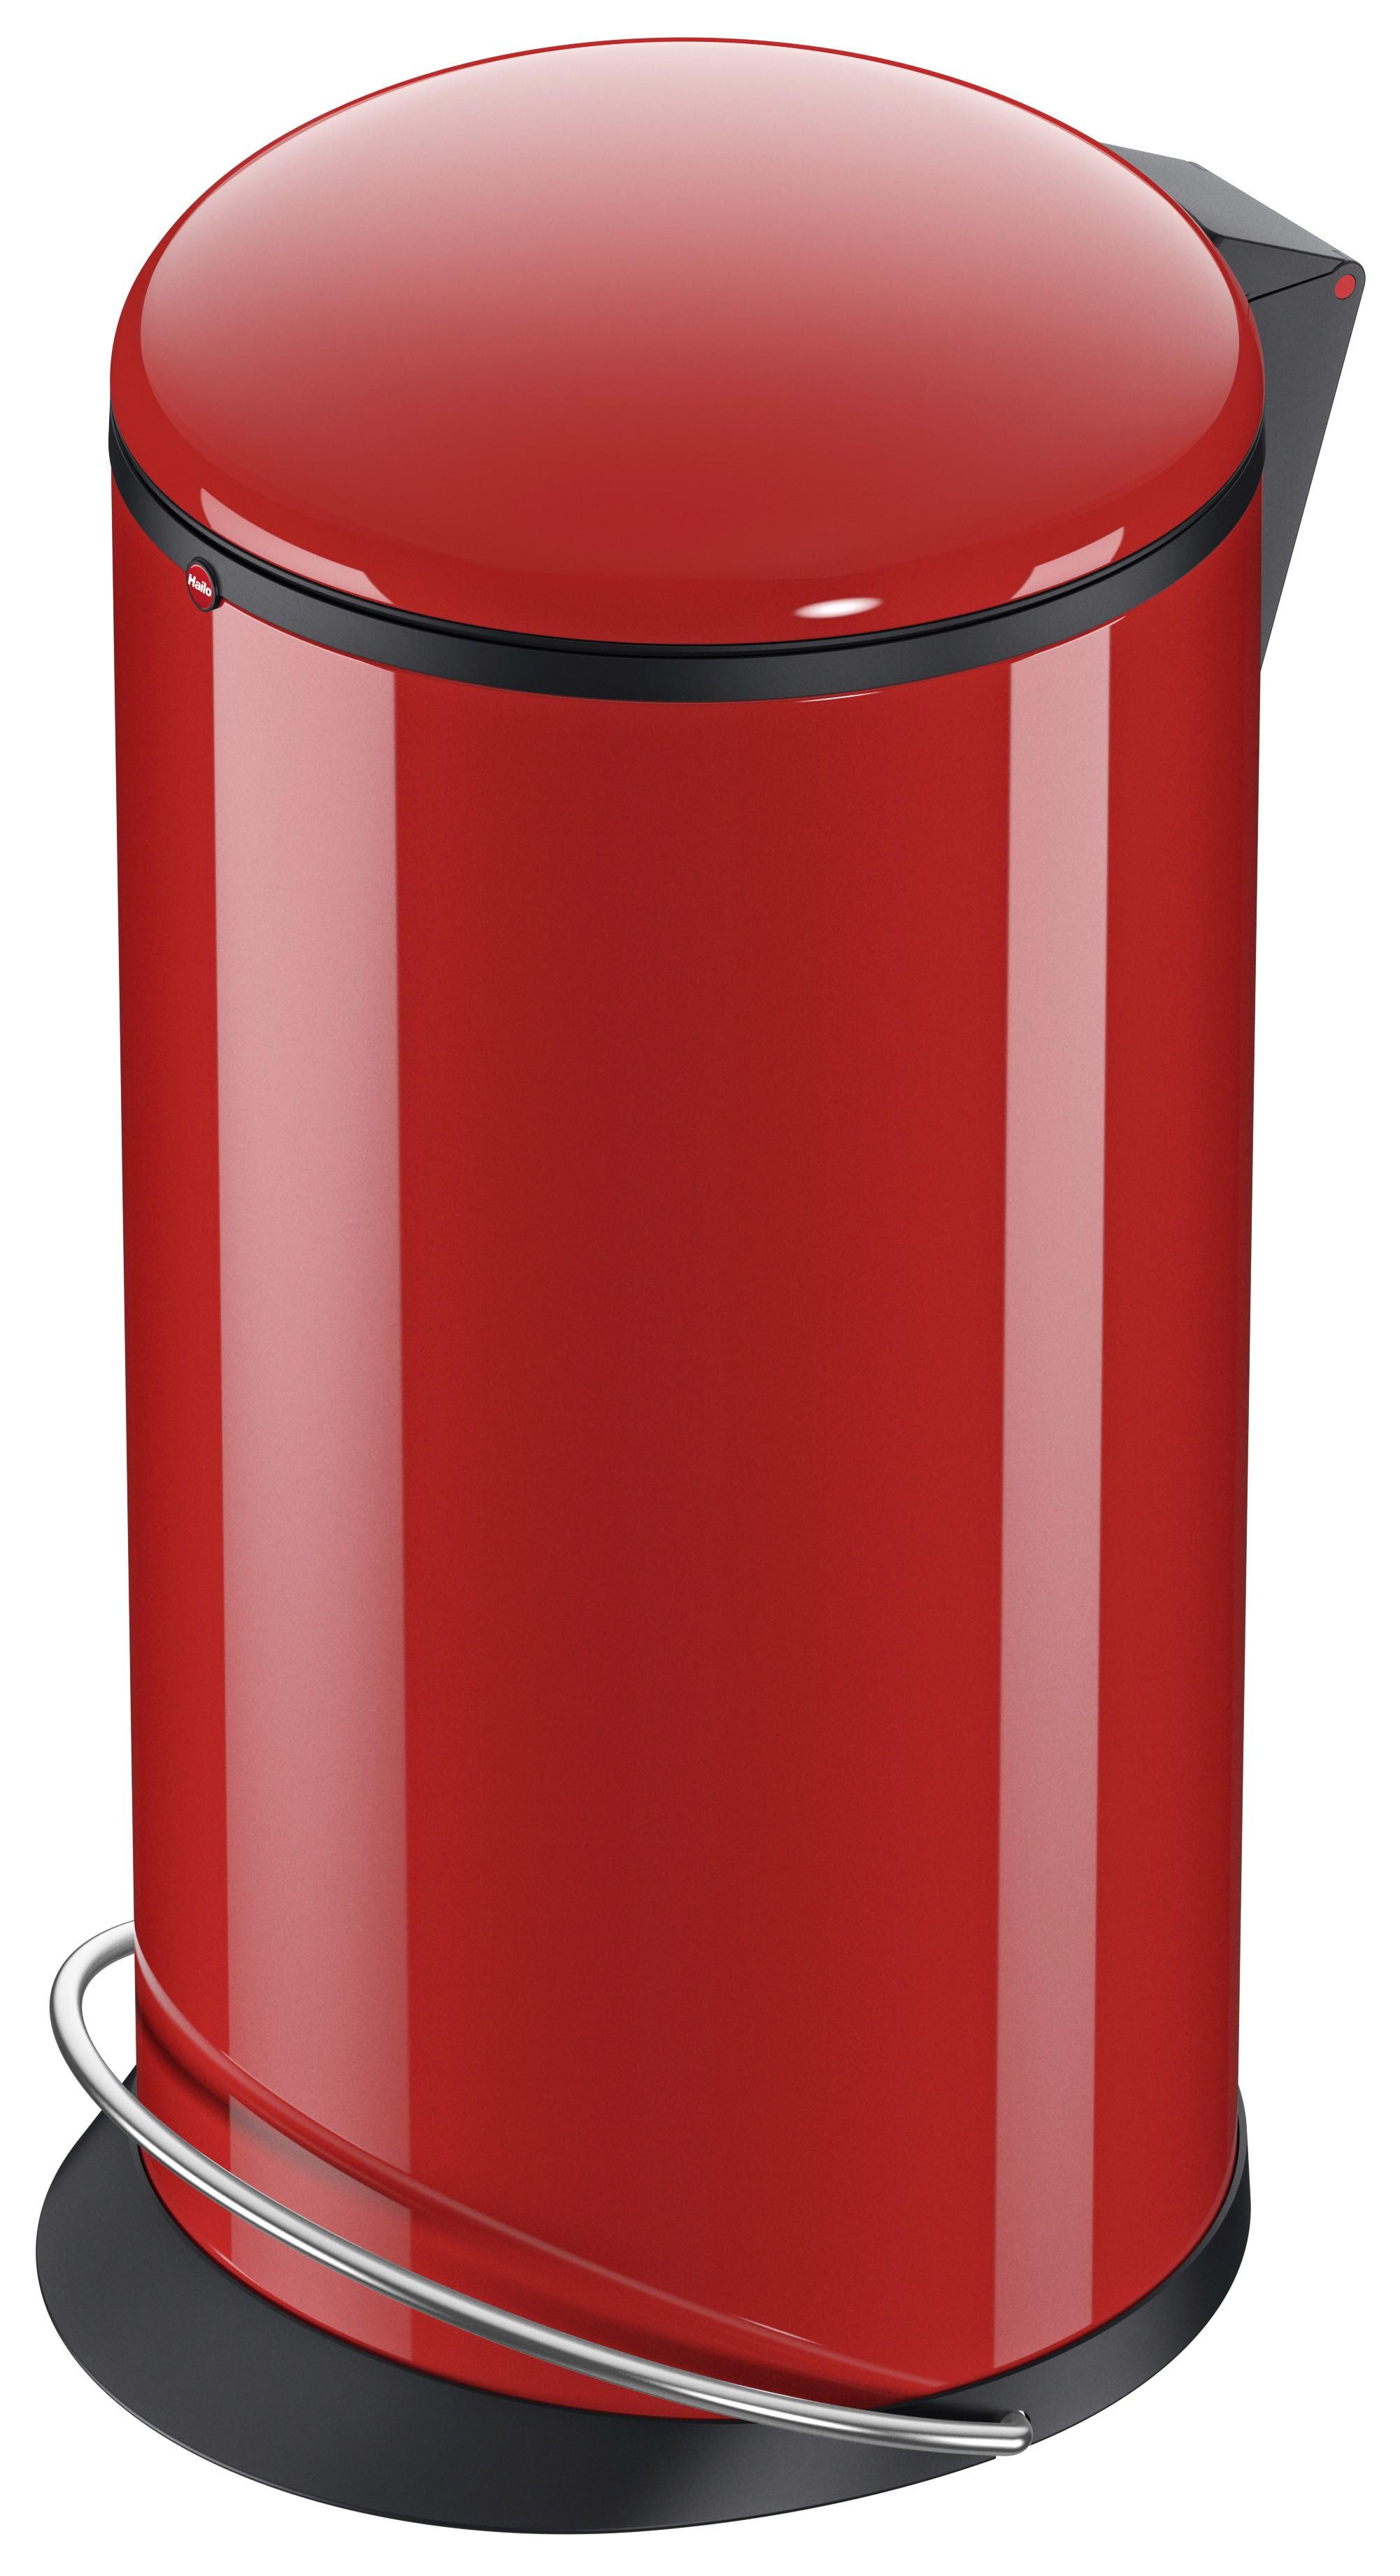 Hailo Harmony L, rot, 20 Liter, Inneneimer: Kunststoff, schwarz, Tret-Abfallsammler